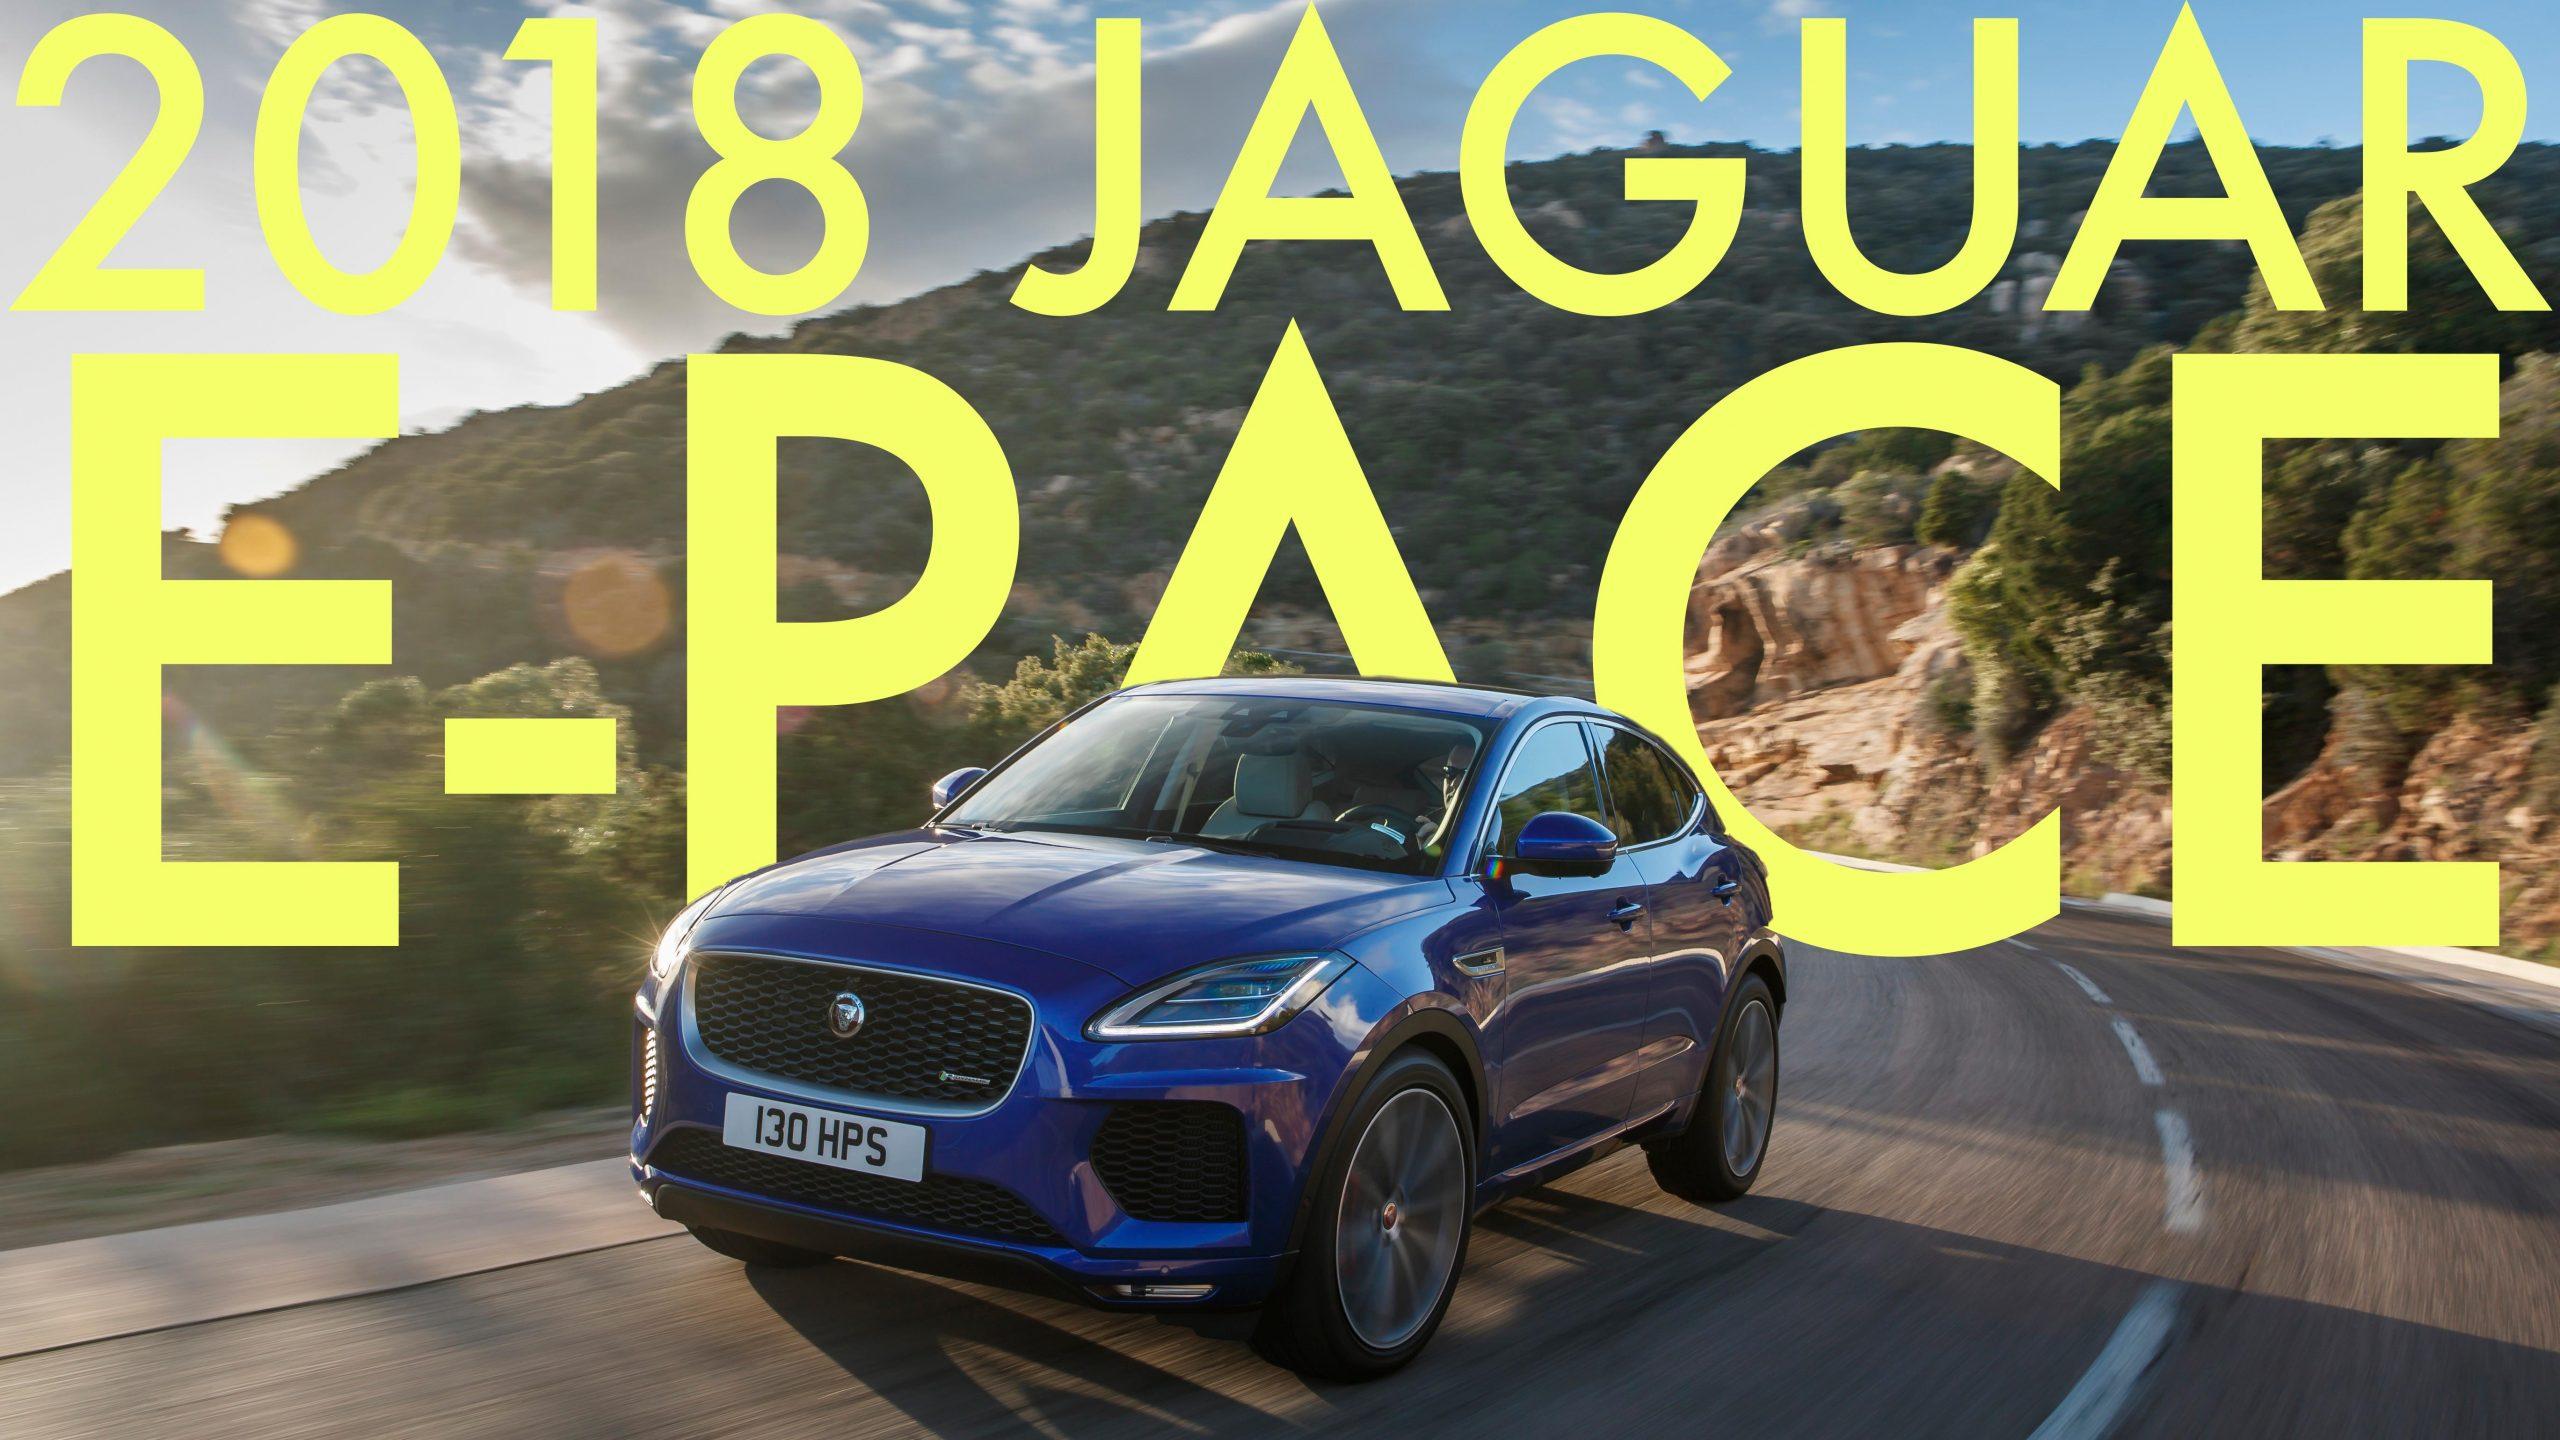 Jaguar Land Wanderer proprietor Tata enforces turn-around strategy as JLR sales lag